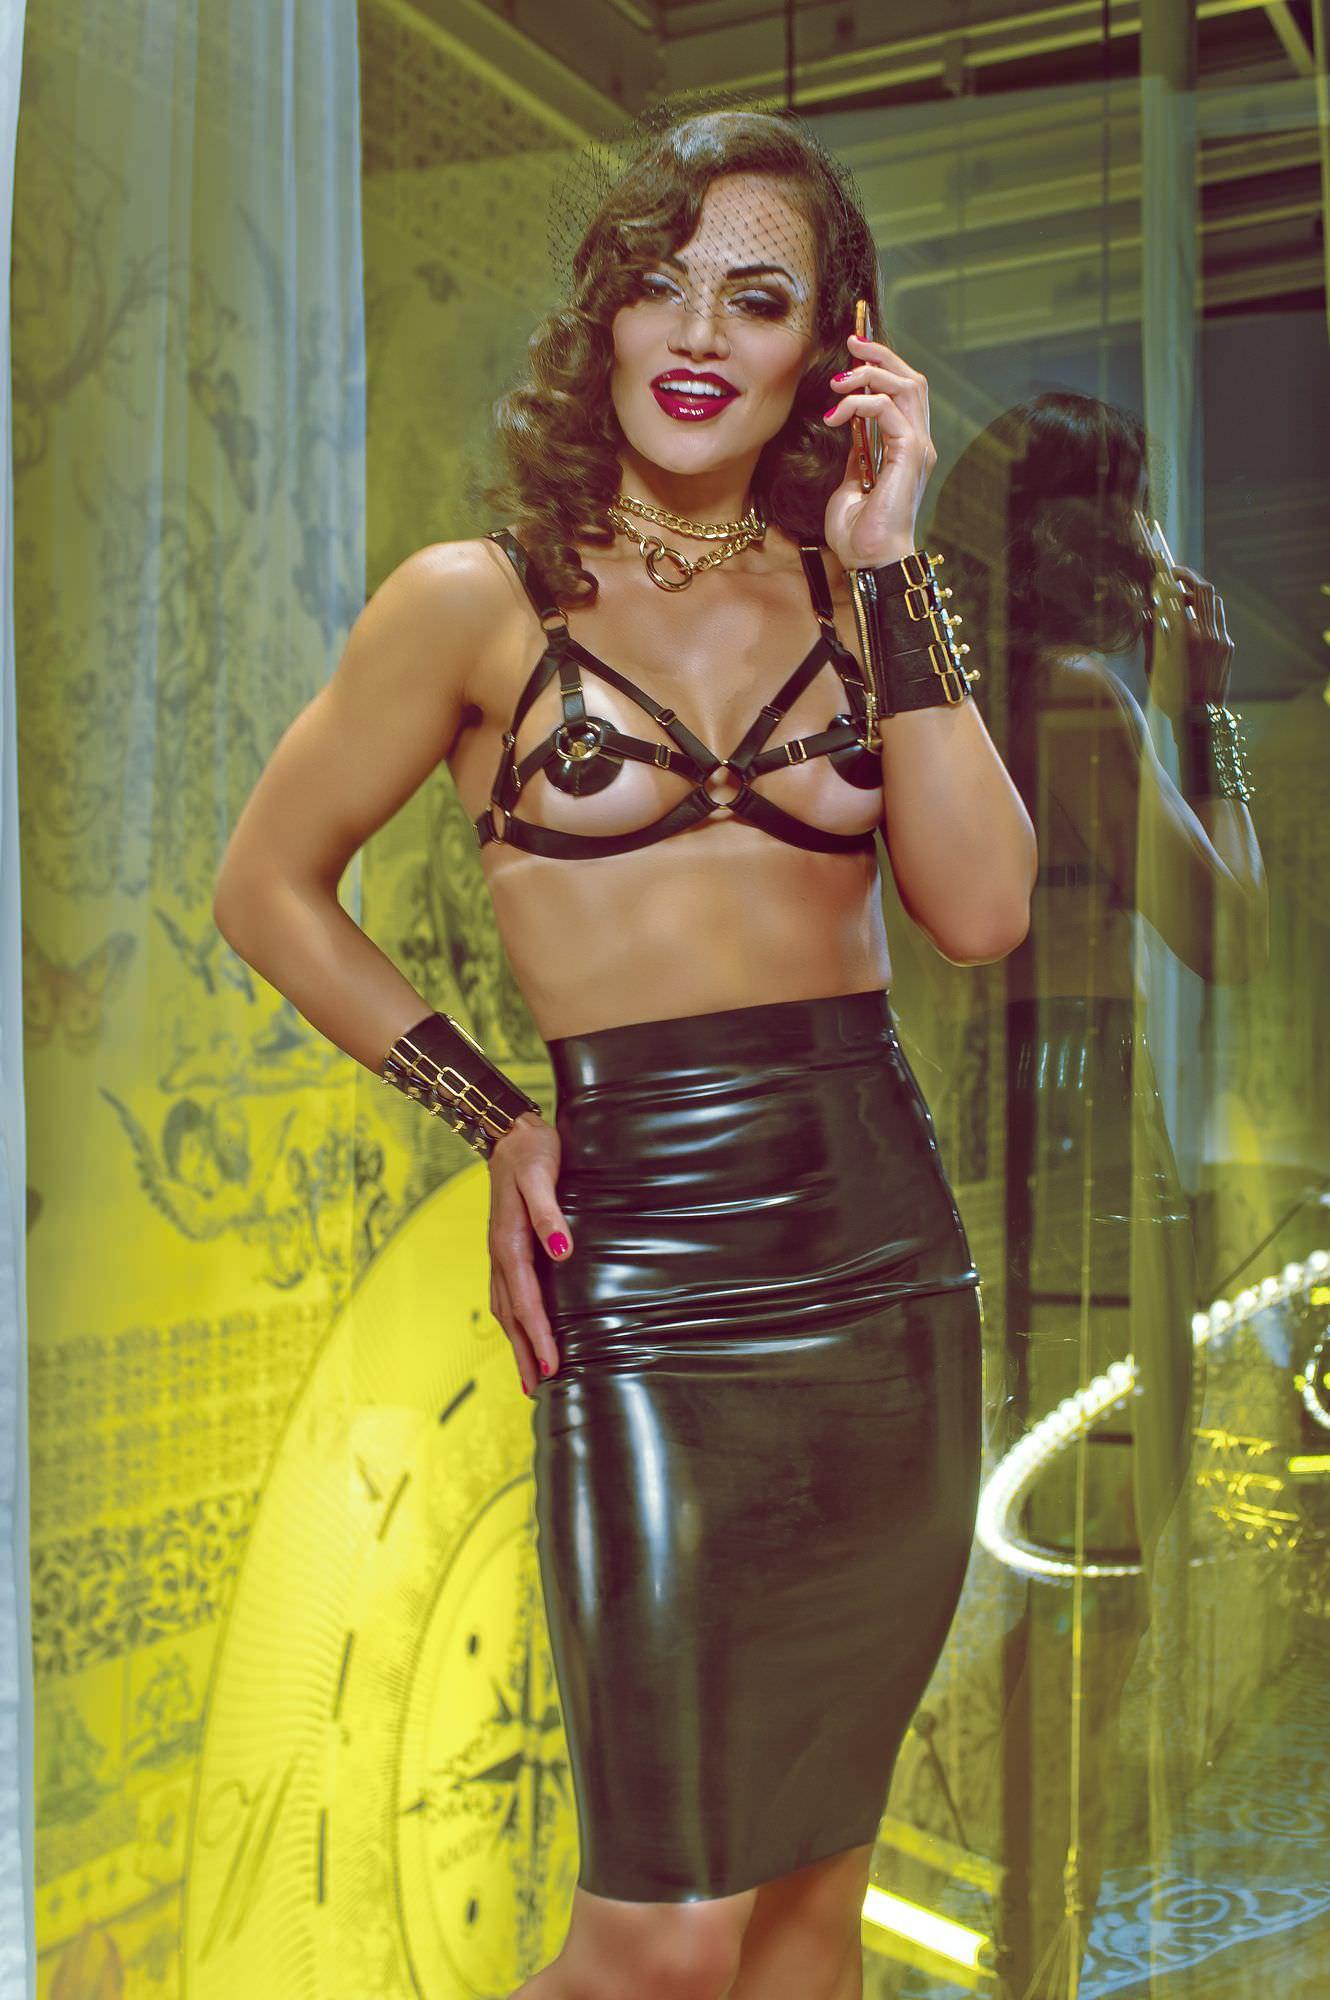 Alex Escort Vip Amsterdam Agency Diva